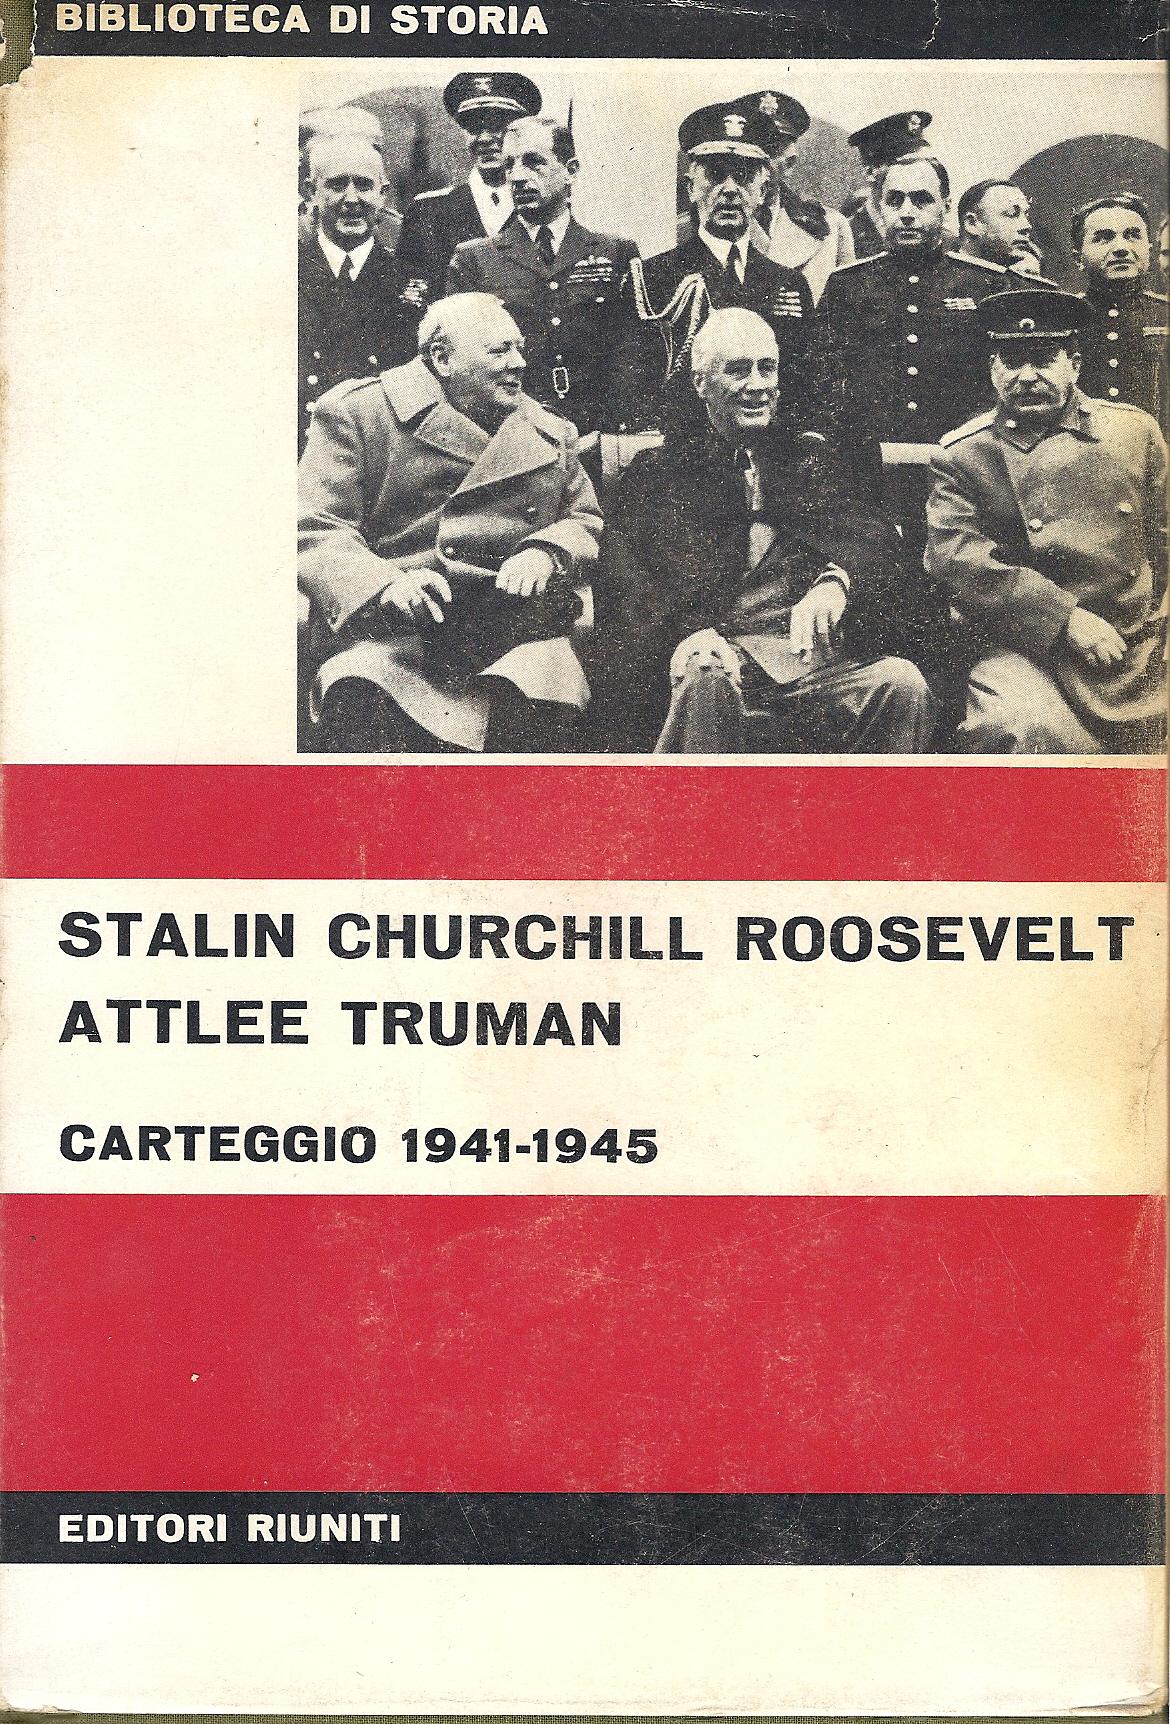 Stalin Churchill Roosevelt Attlee Truman